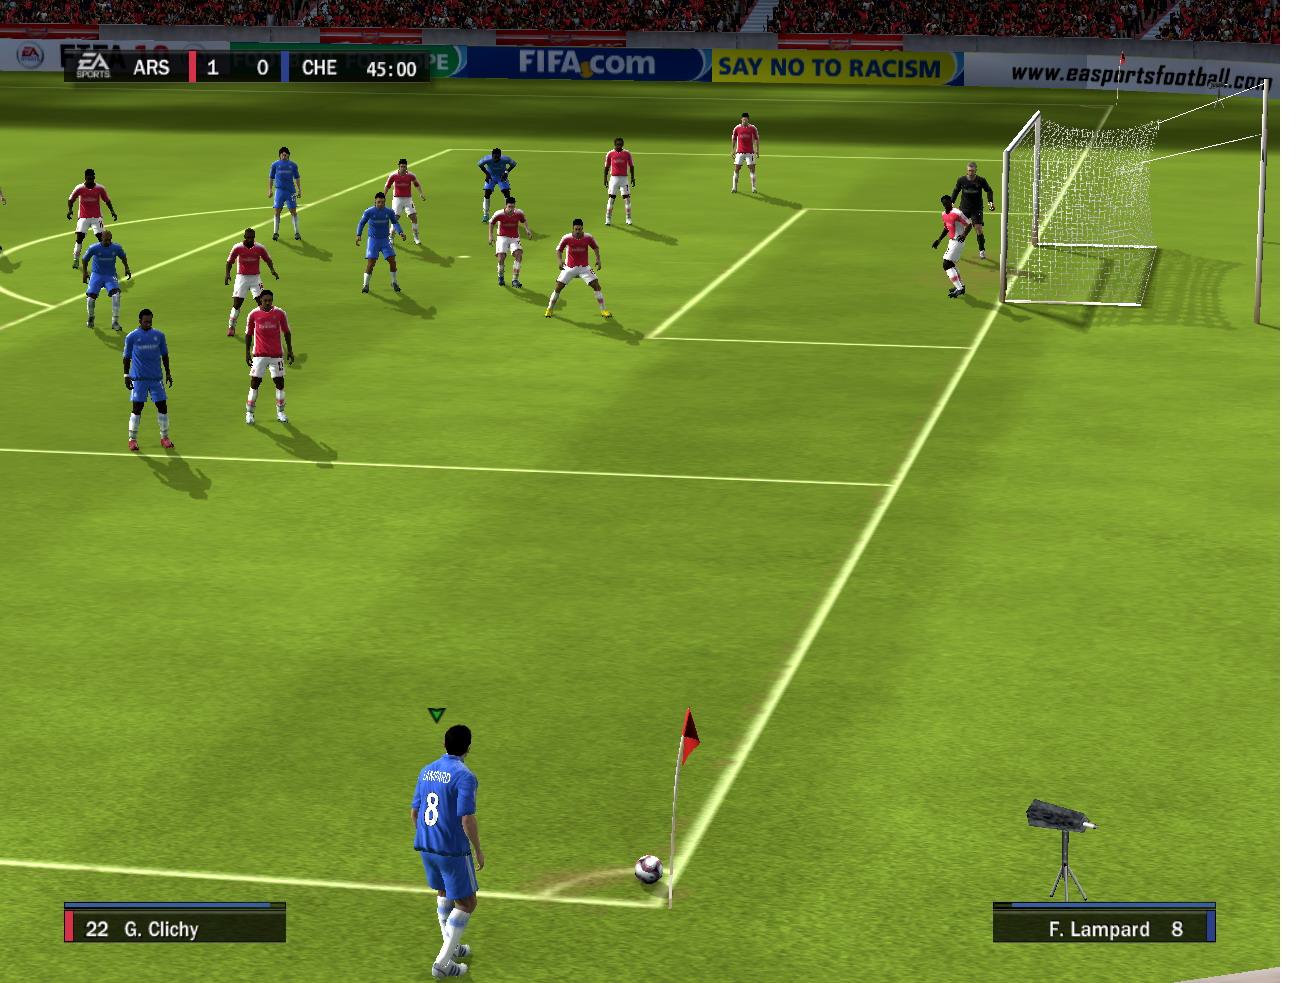 El trailer GamesCom de FIFA 11 está de pelos [Videos]